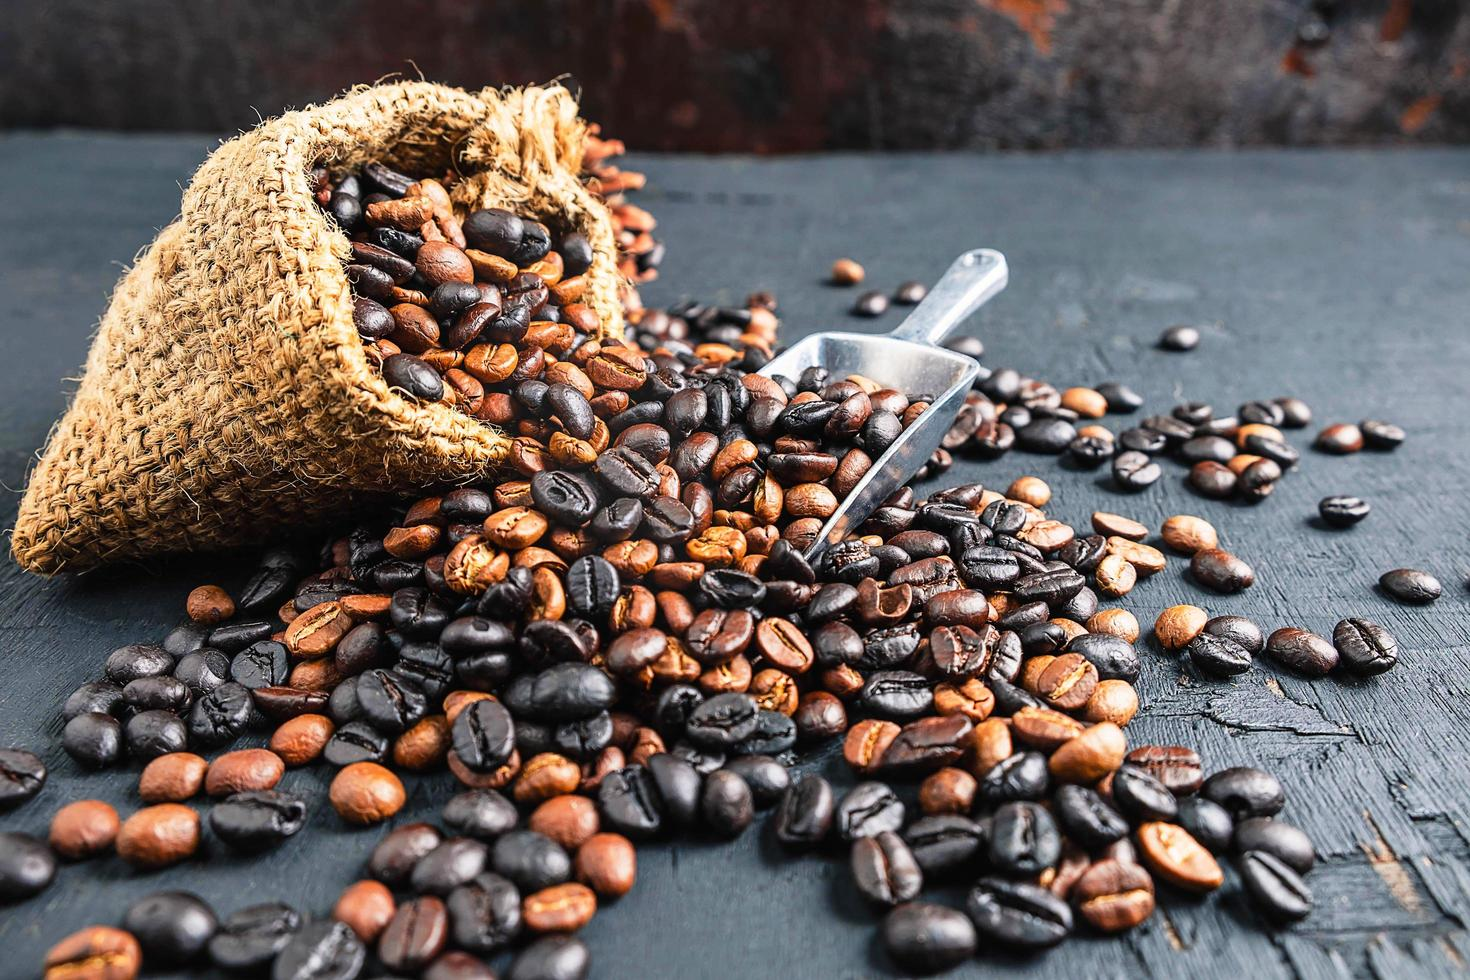 grains de café dans un sac en tissu marron photo